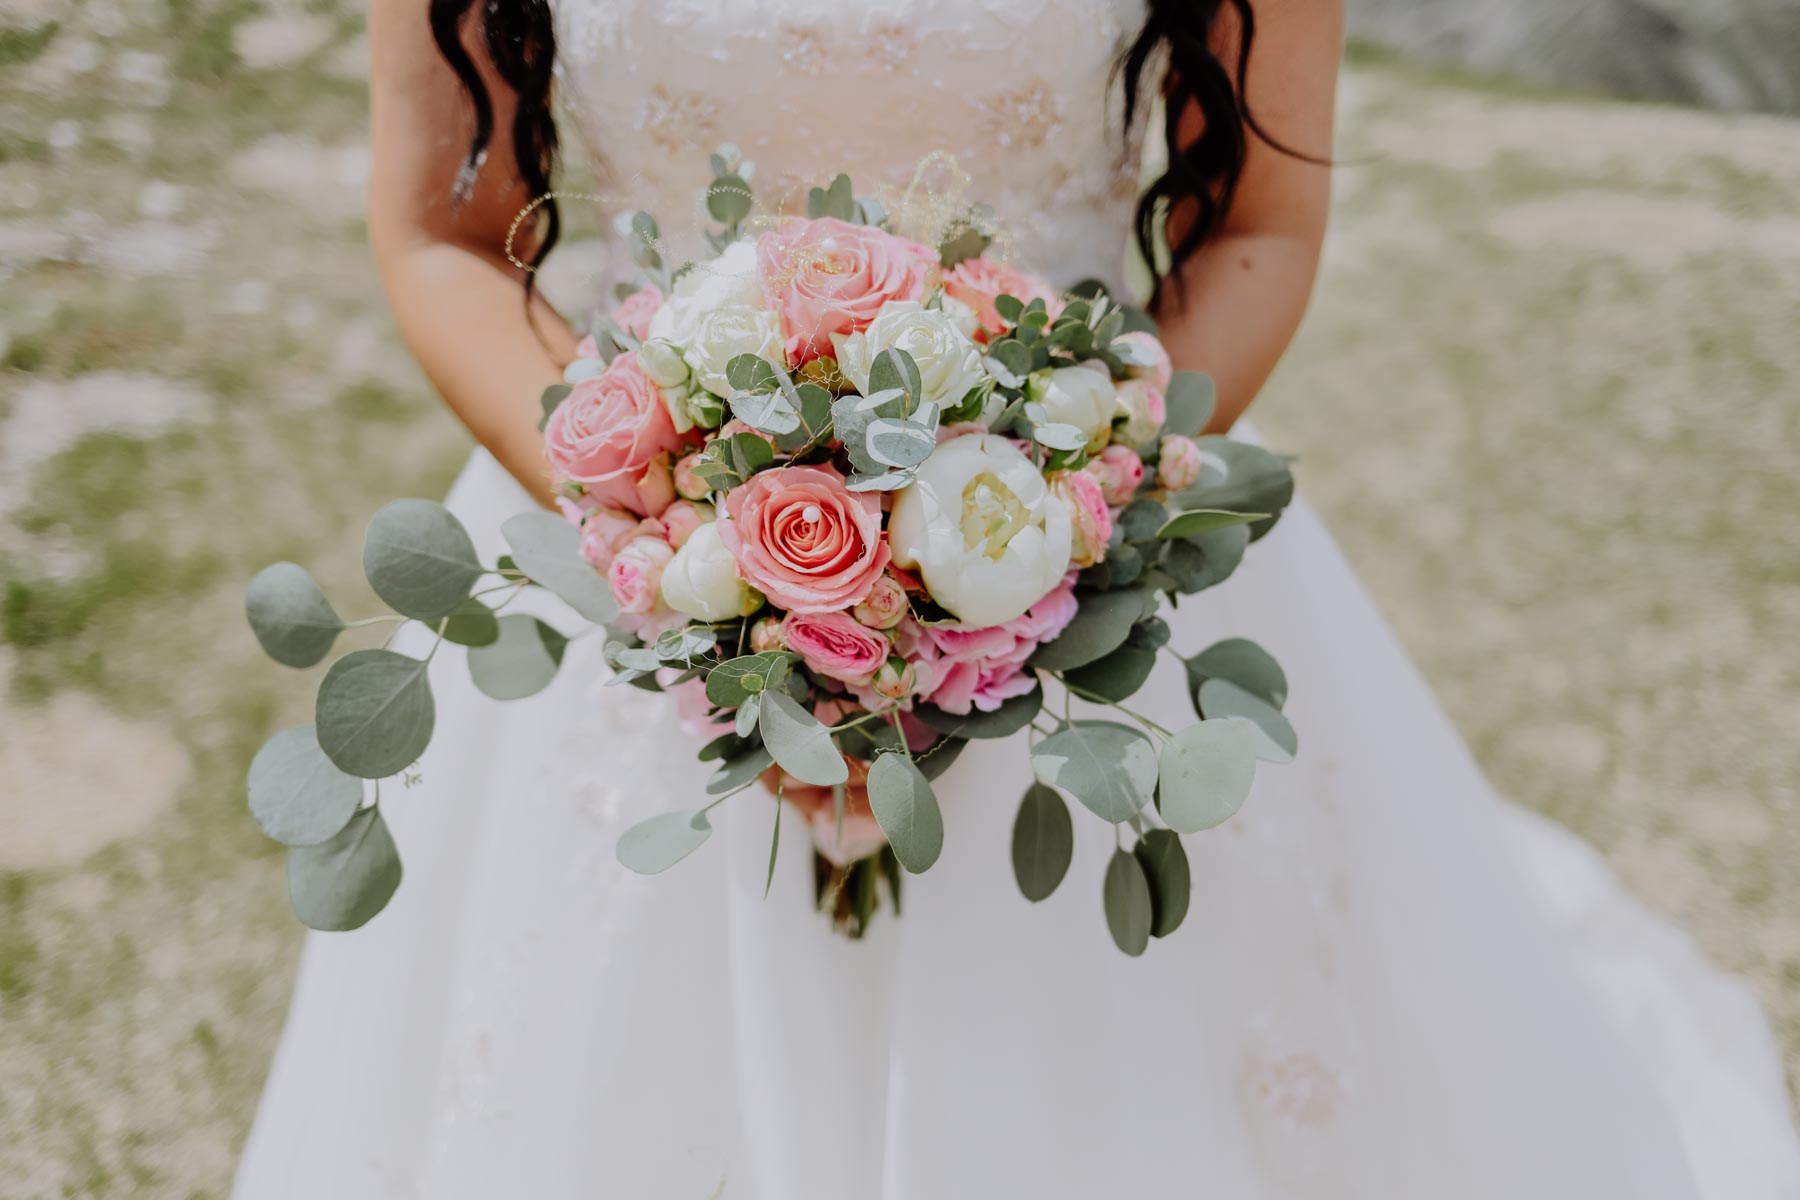 Brautstrauß mit Eukalyptus und rosa Rosen